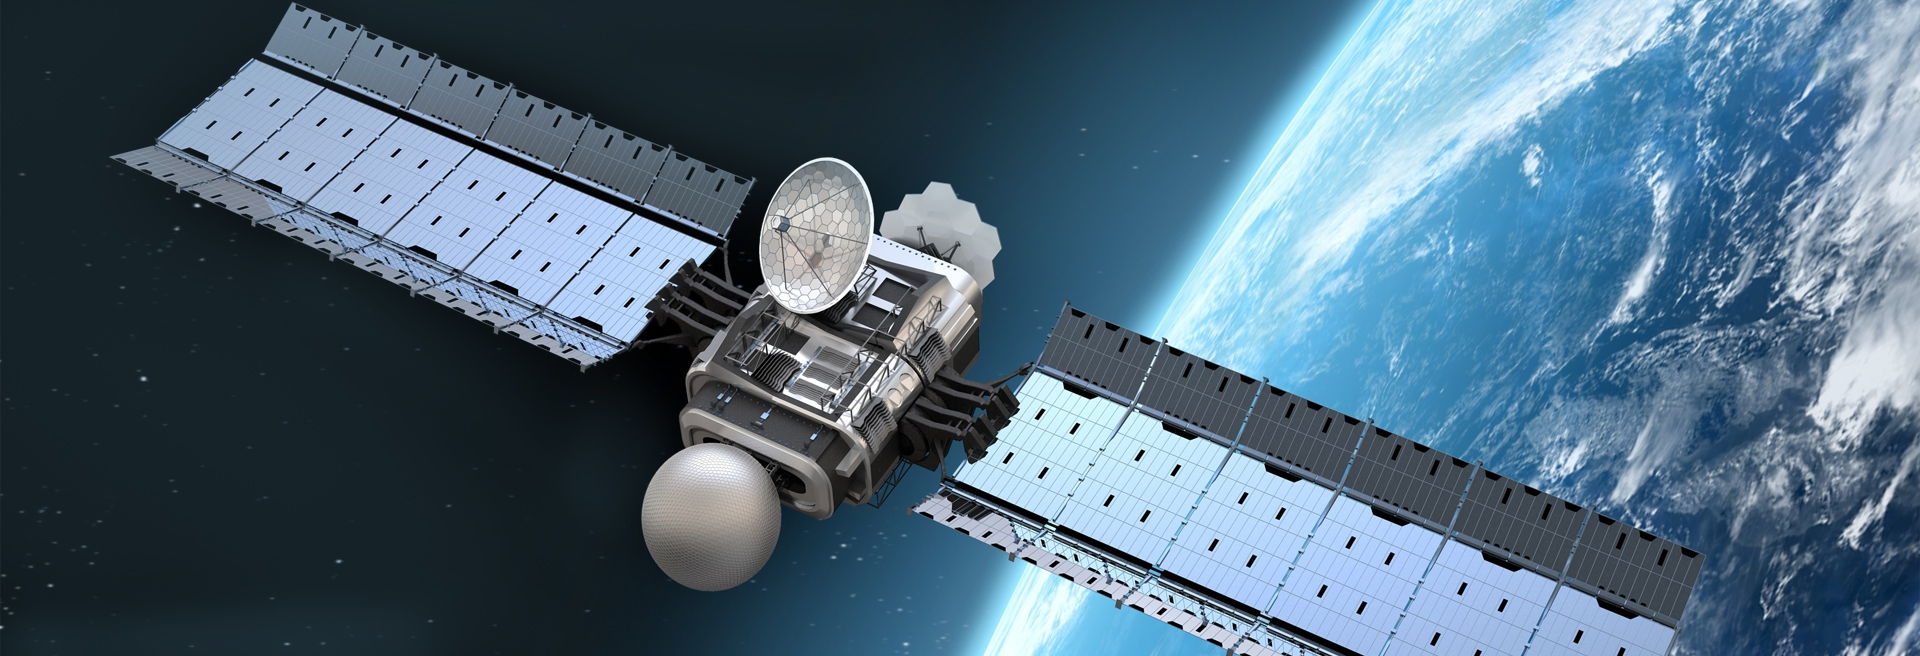 Спутниковая навигация